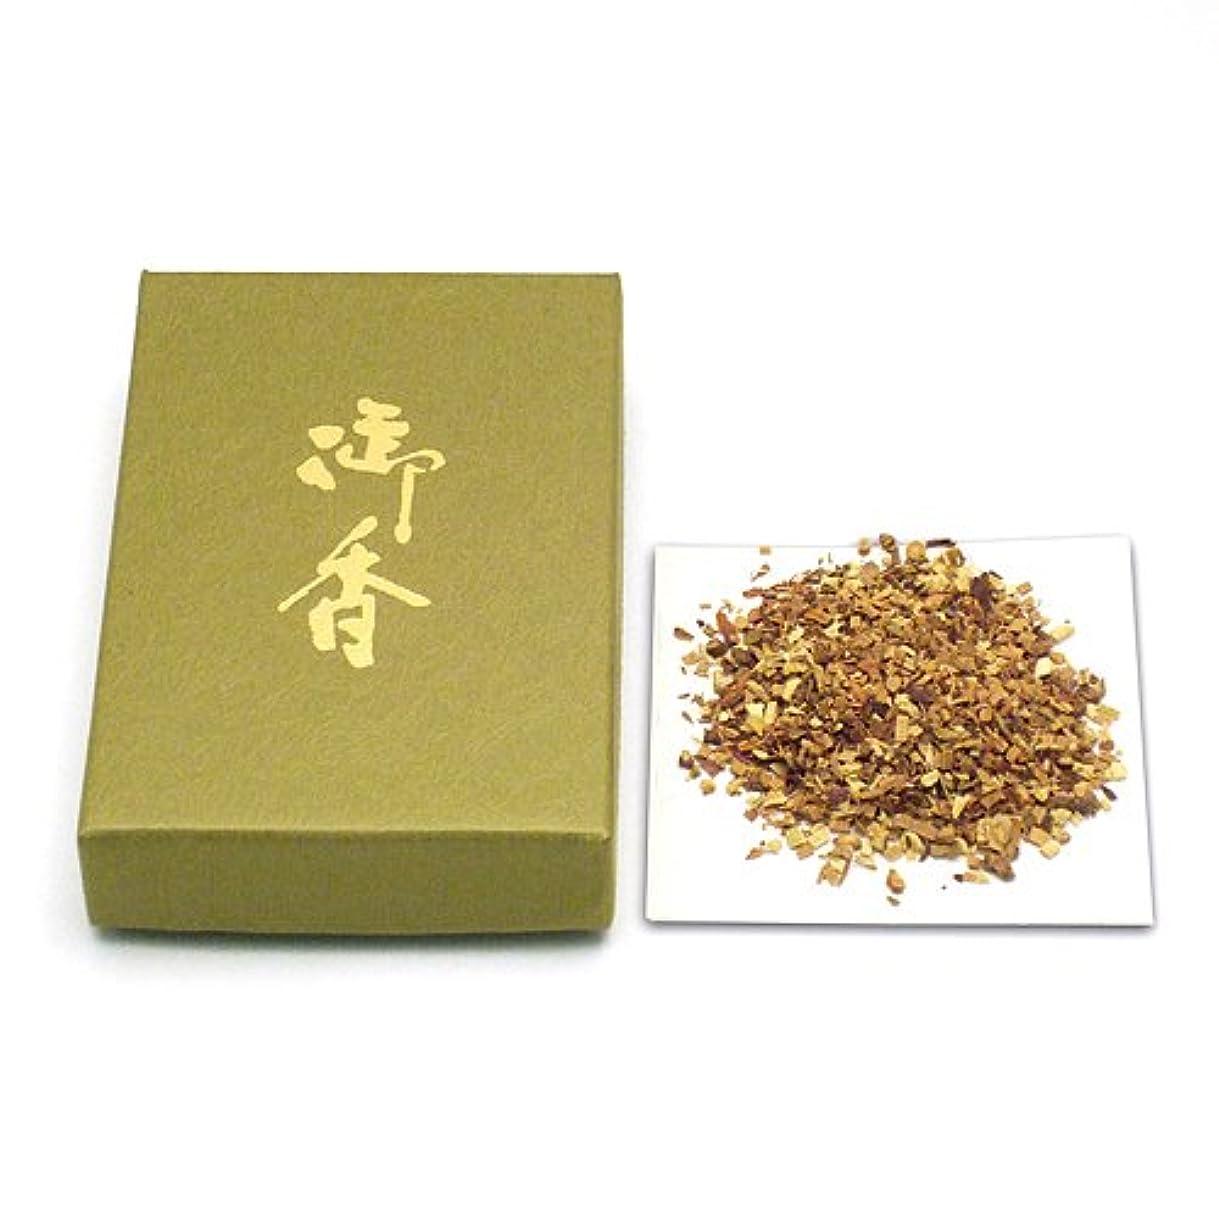 桃タウポ湖寓話焼香用御香 超徳印 25g◆お焼香用の御香